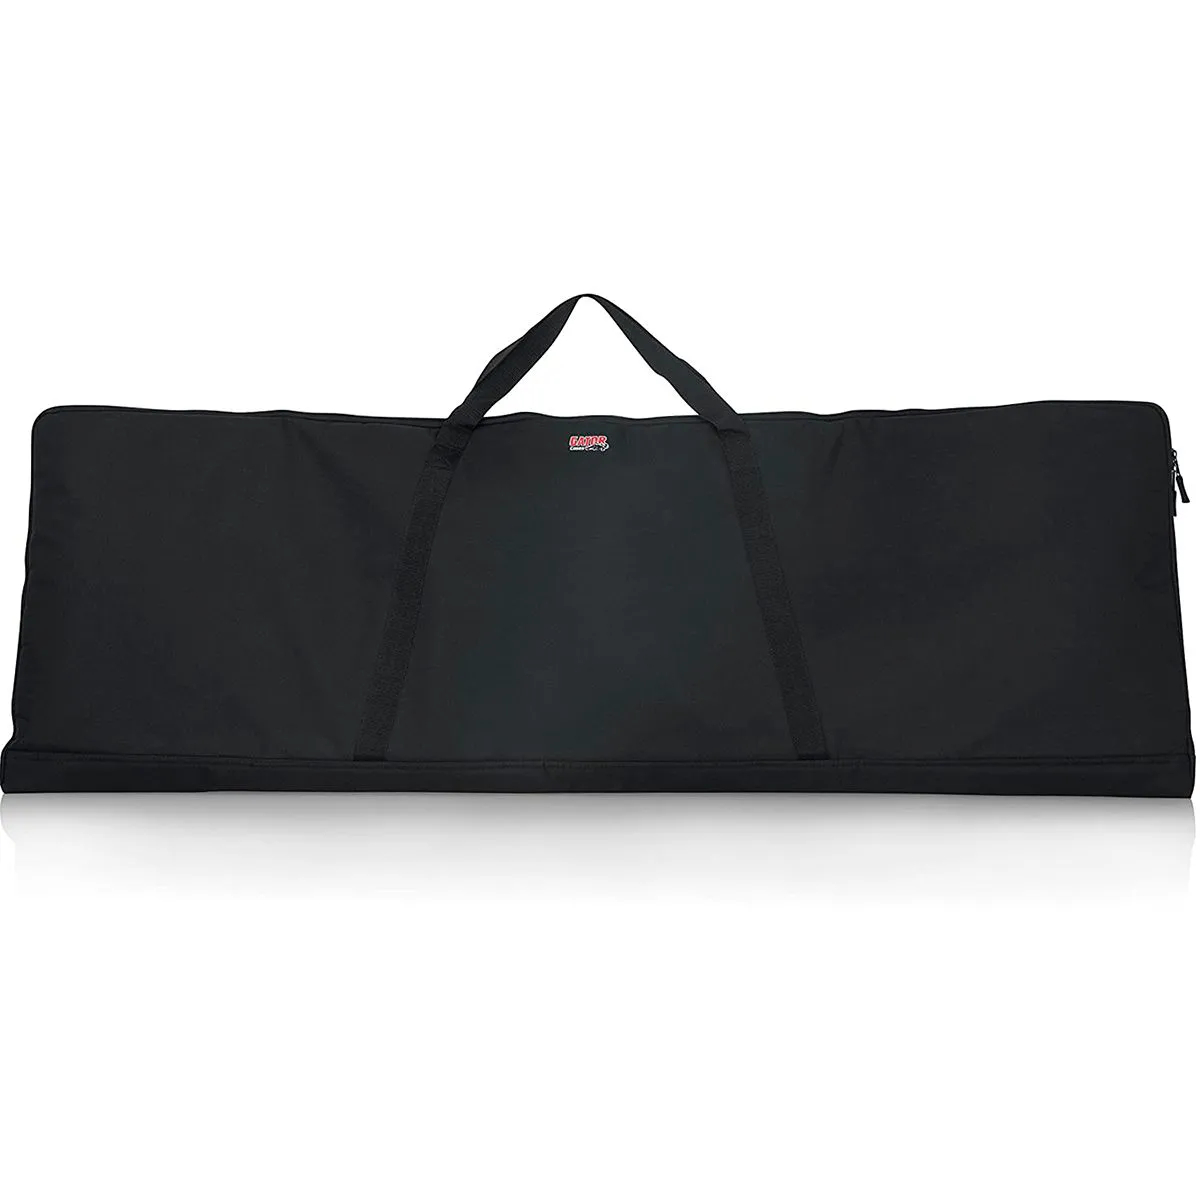 Bag Gator GKBE-88 para Teclado de 88 Teclas